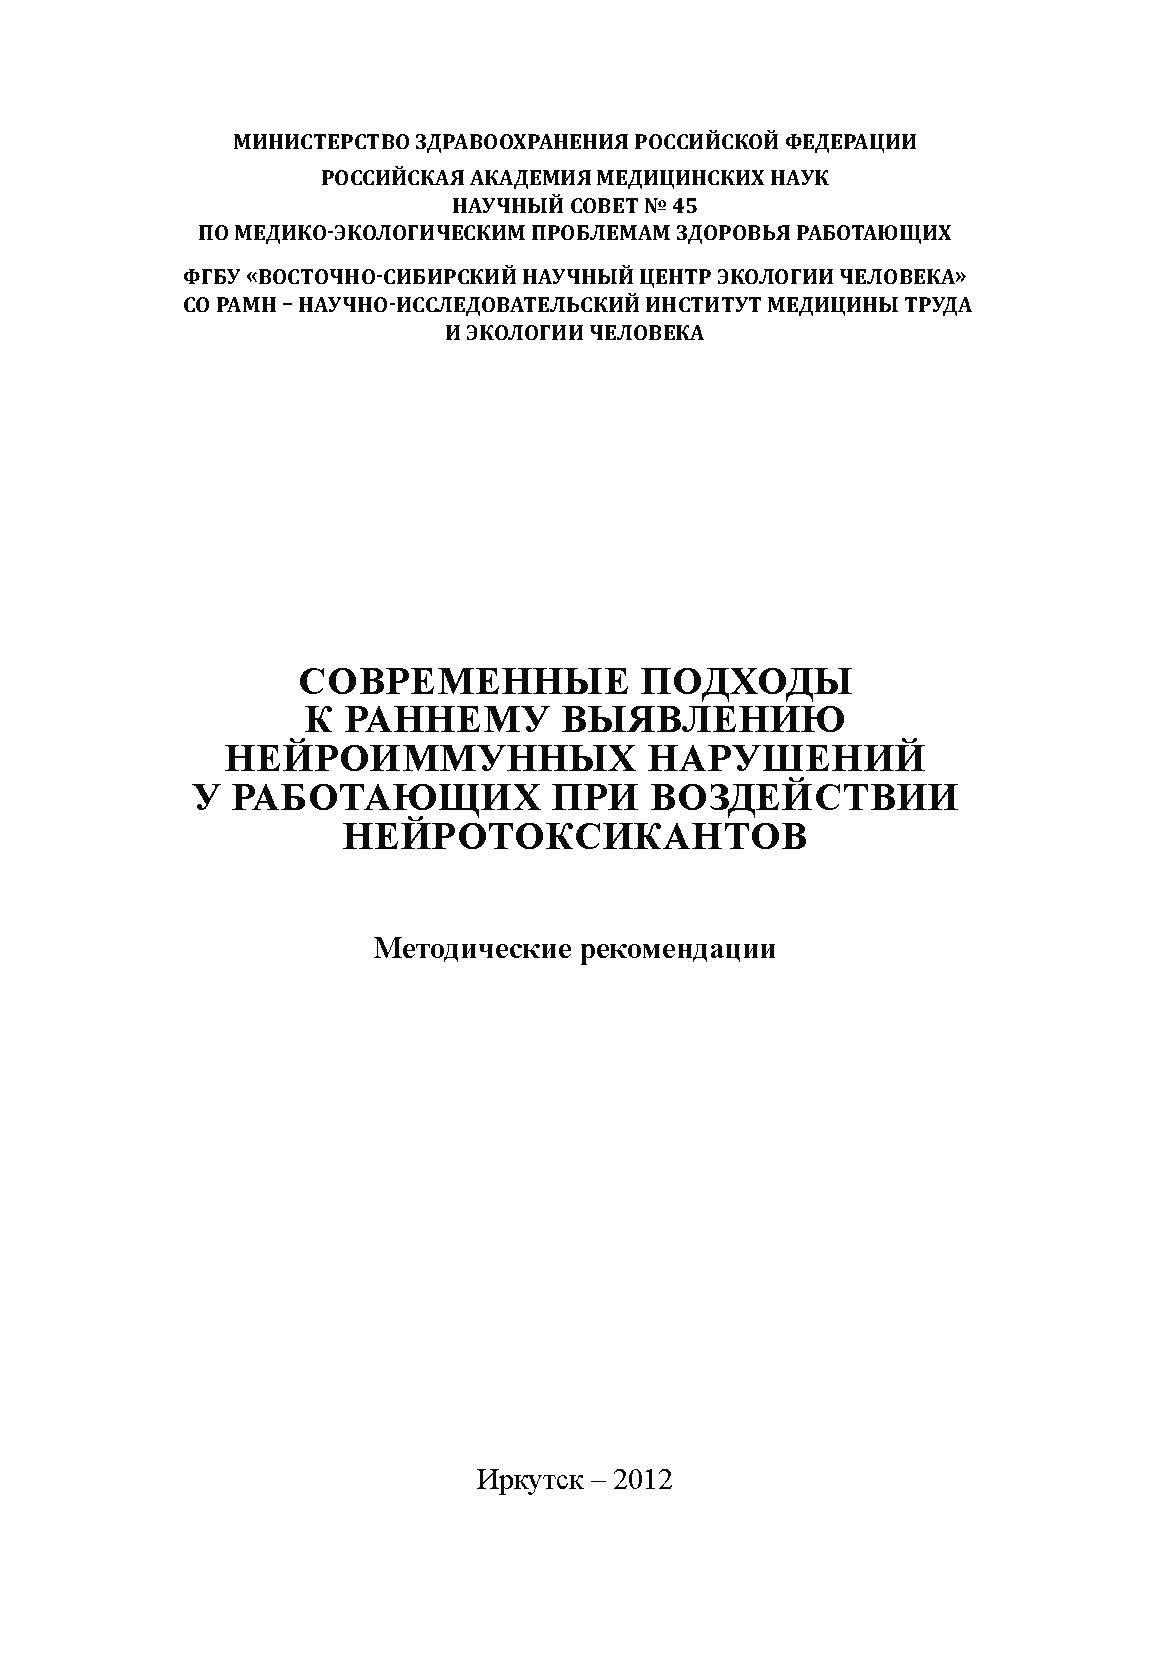 Бодиенкова_2012